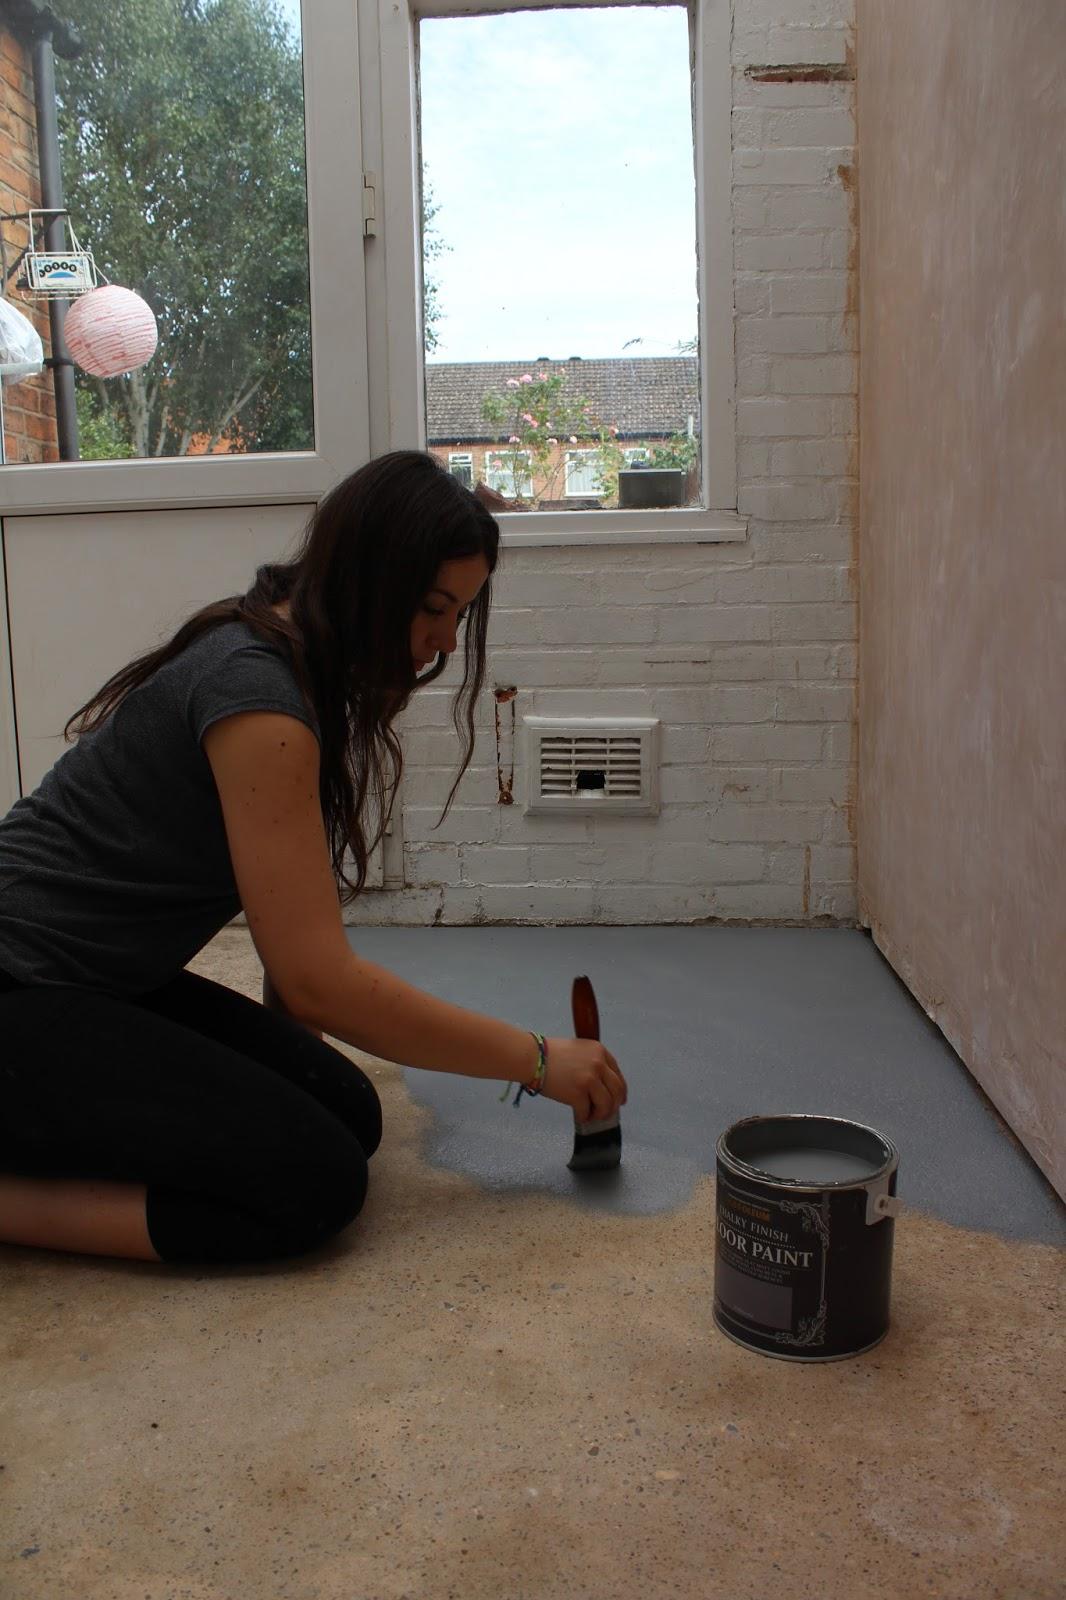 DIY painting a concrete floor